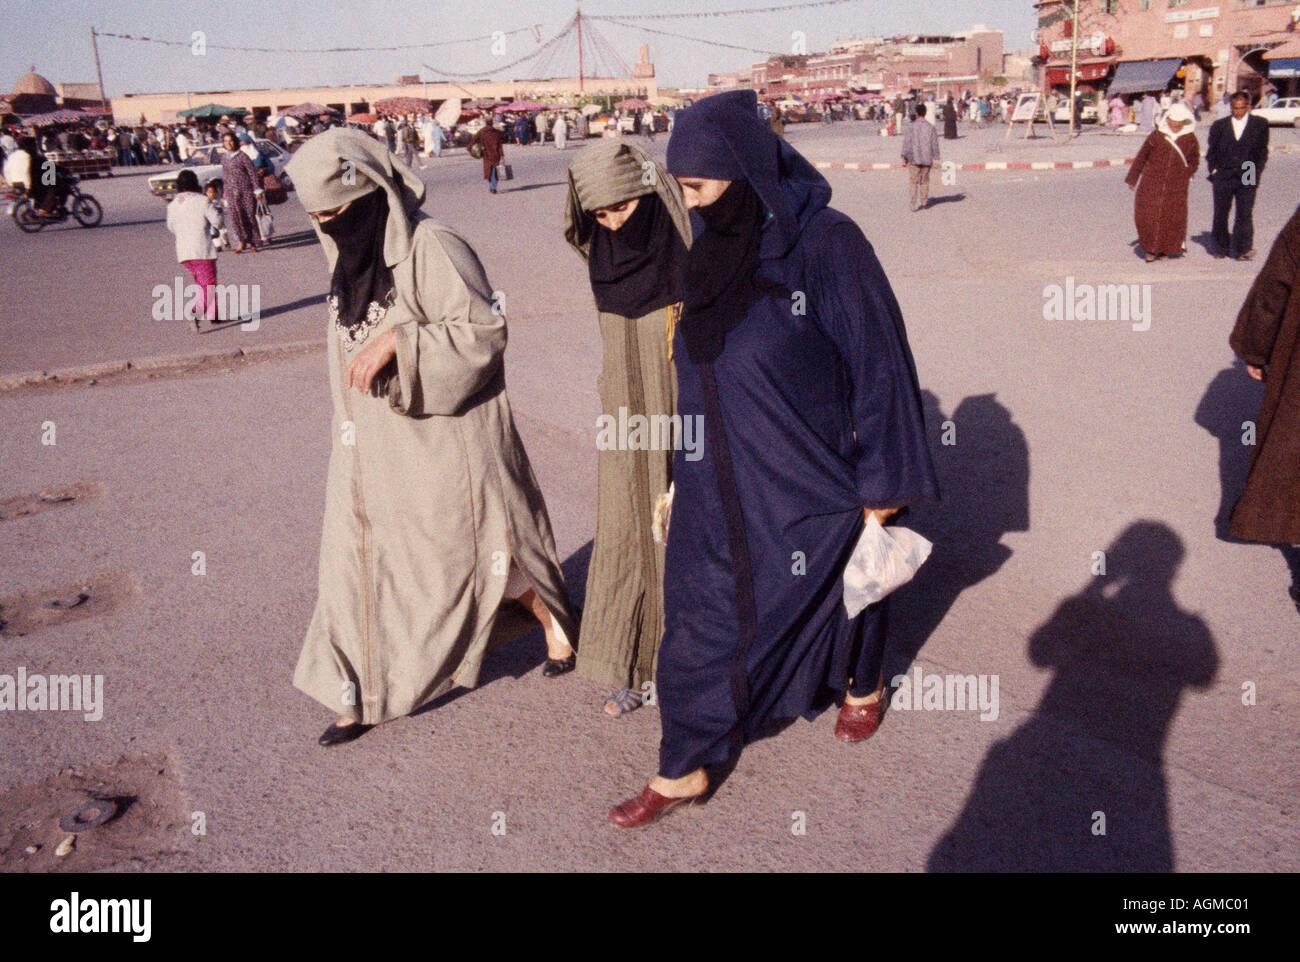 Yahmak veiled women in Djemma El Fna in Marrakech Marrakesh in Morocco in the Maghreb in North Africa Sahara. Reportage Moroccan People Moorish - Stock Image